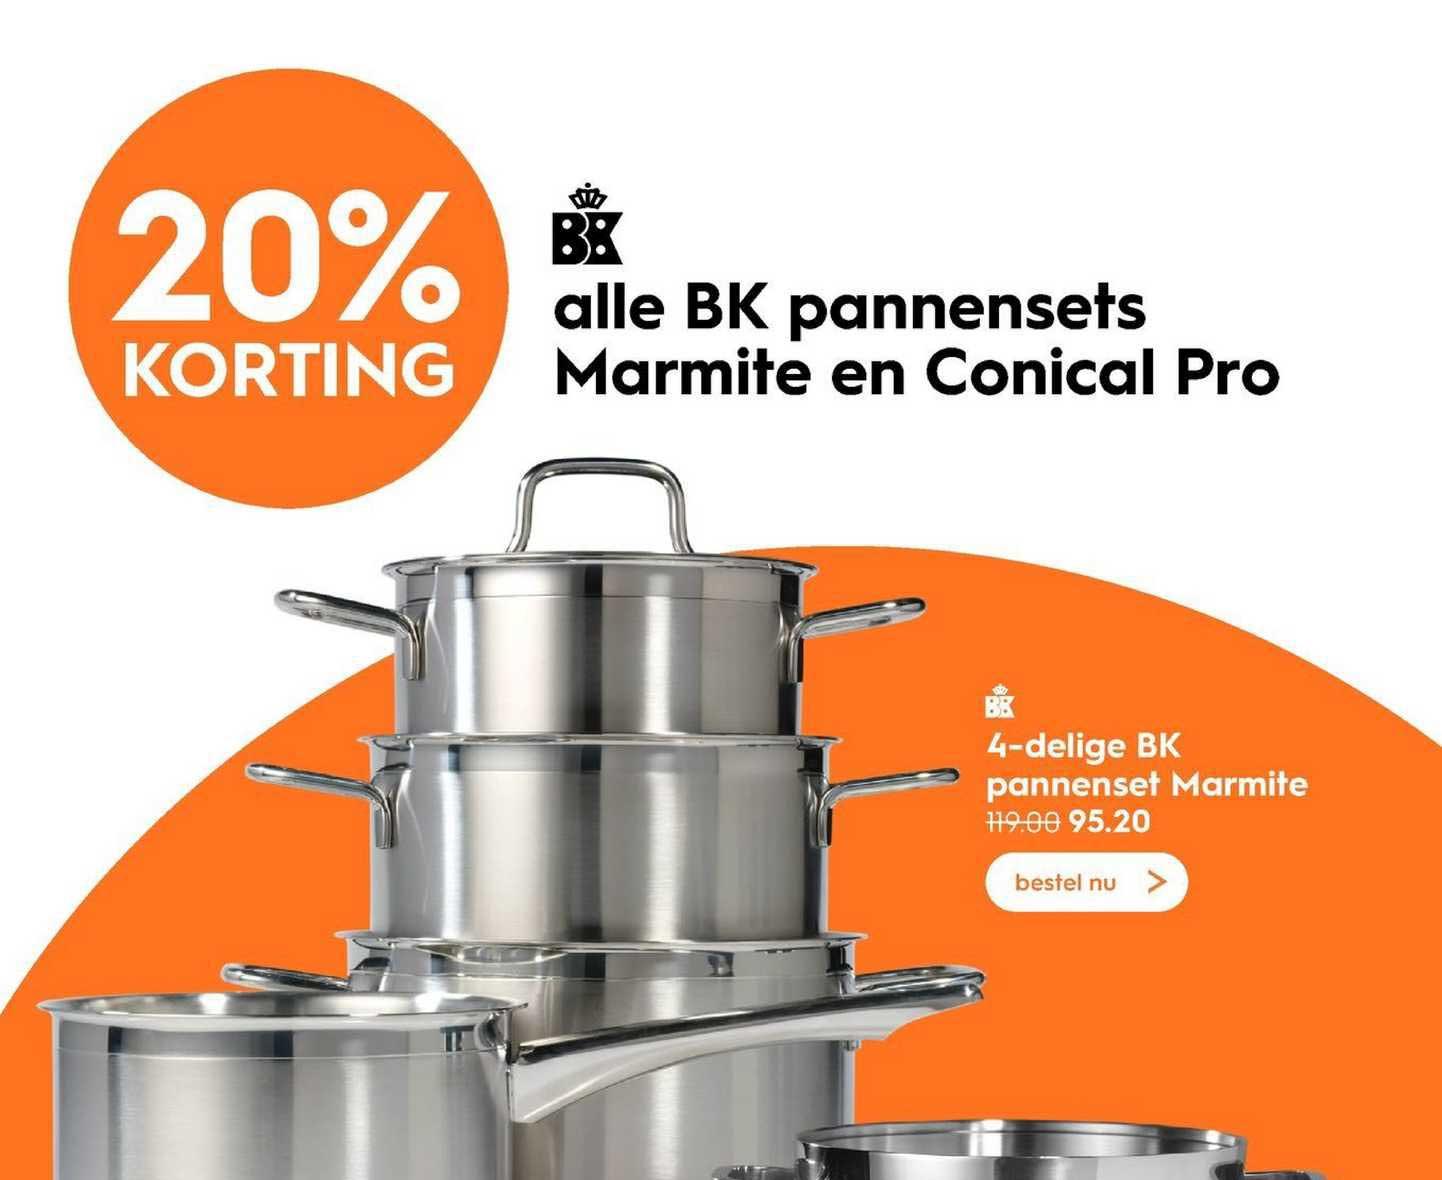 Blokker 4-Delige BK Pannenset Marmite 20% Korting